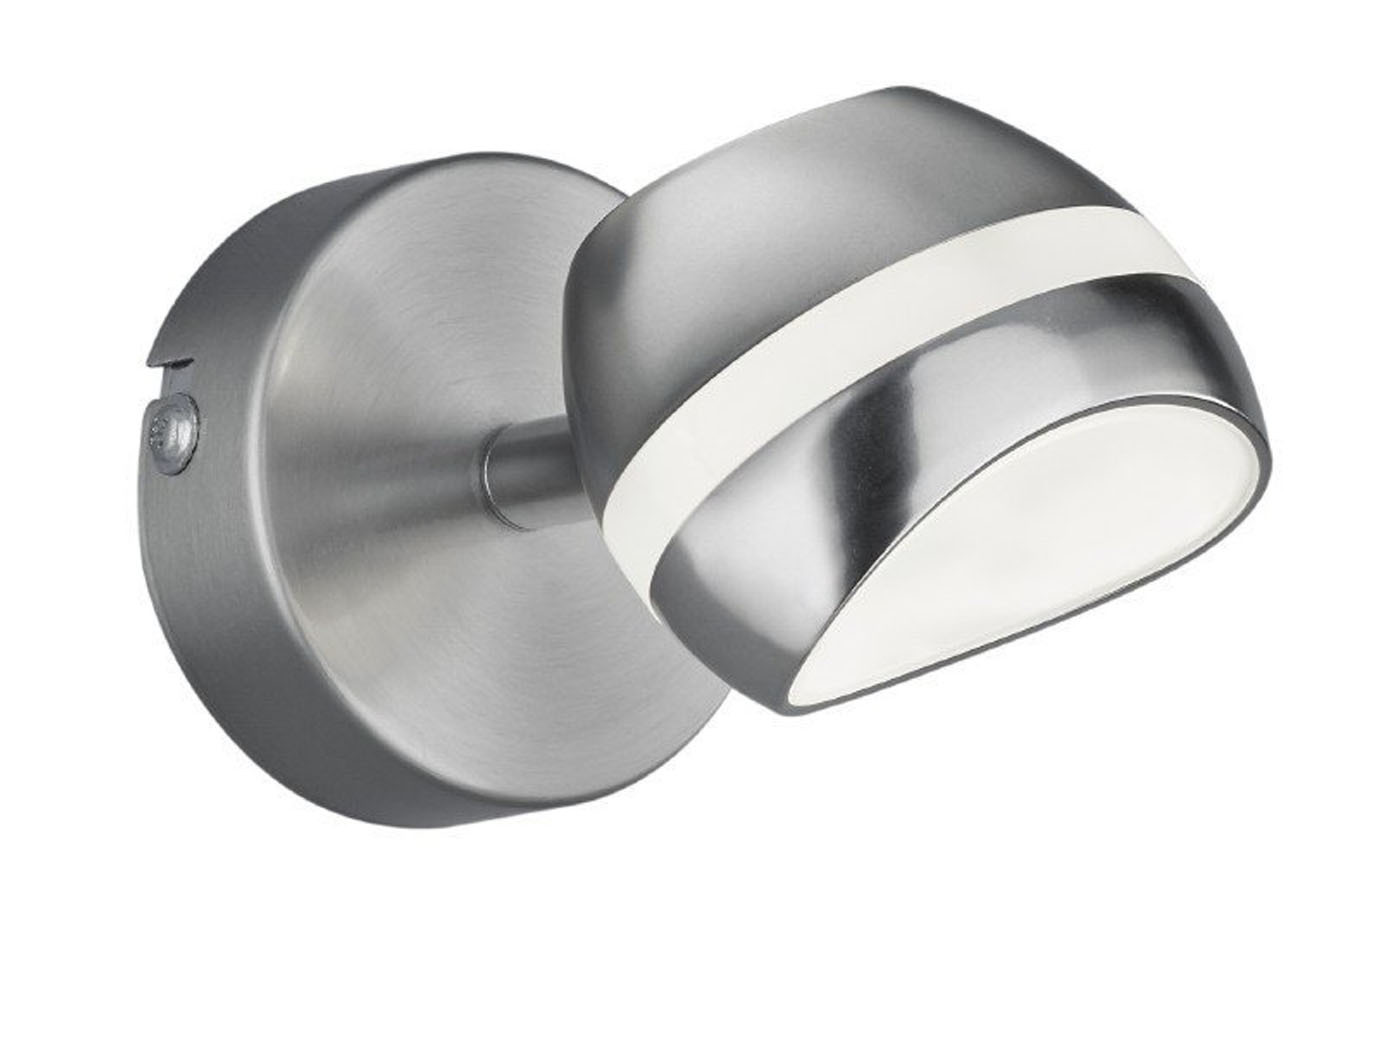 LED Wandleuchte Wandstrahler SHARK Leselampe Wandlampe Wohnraum Strahler modern